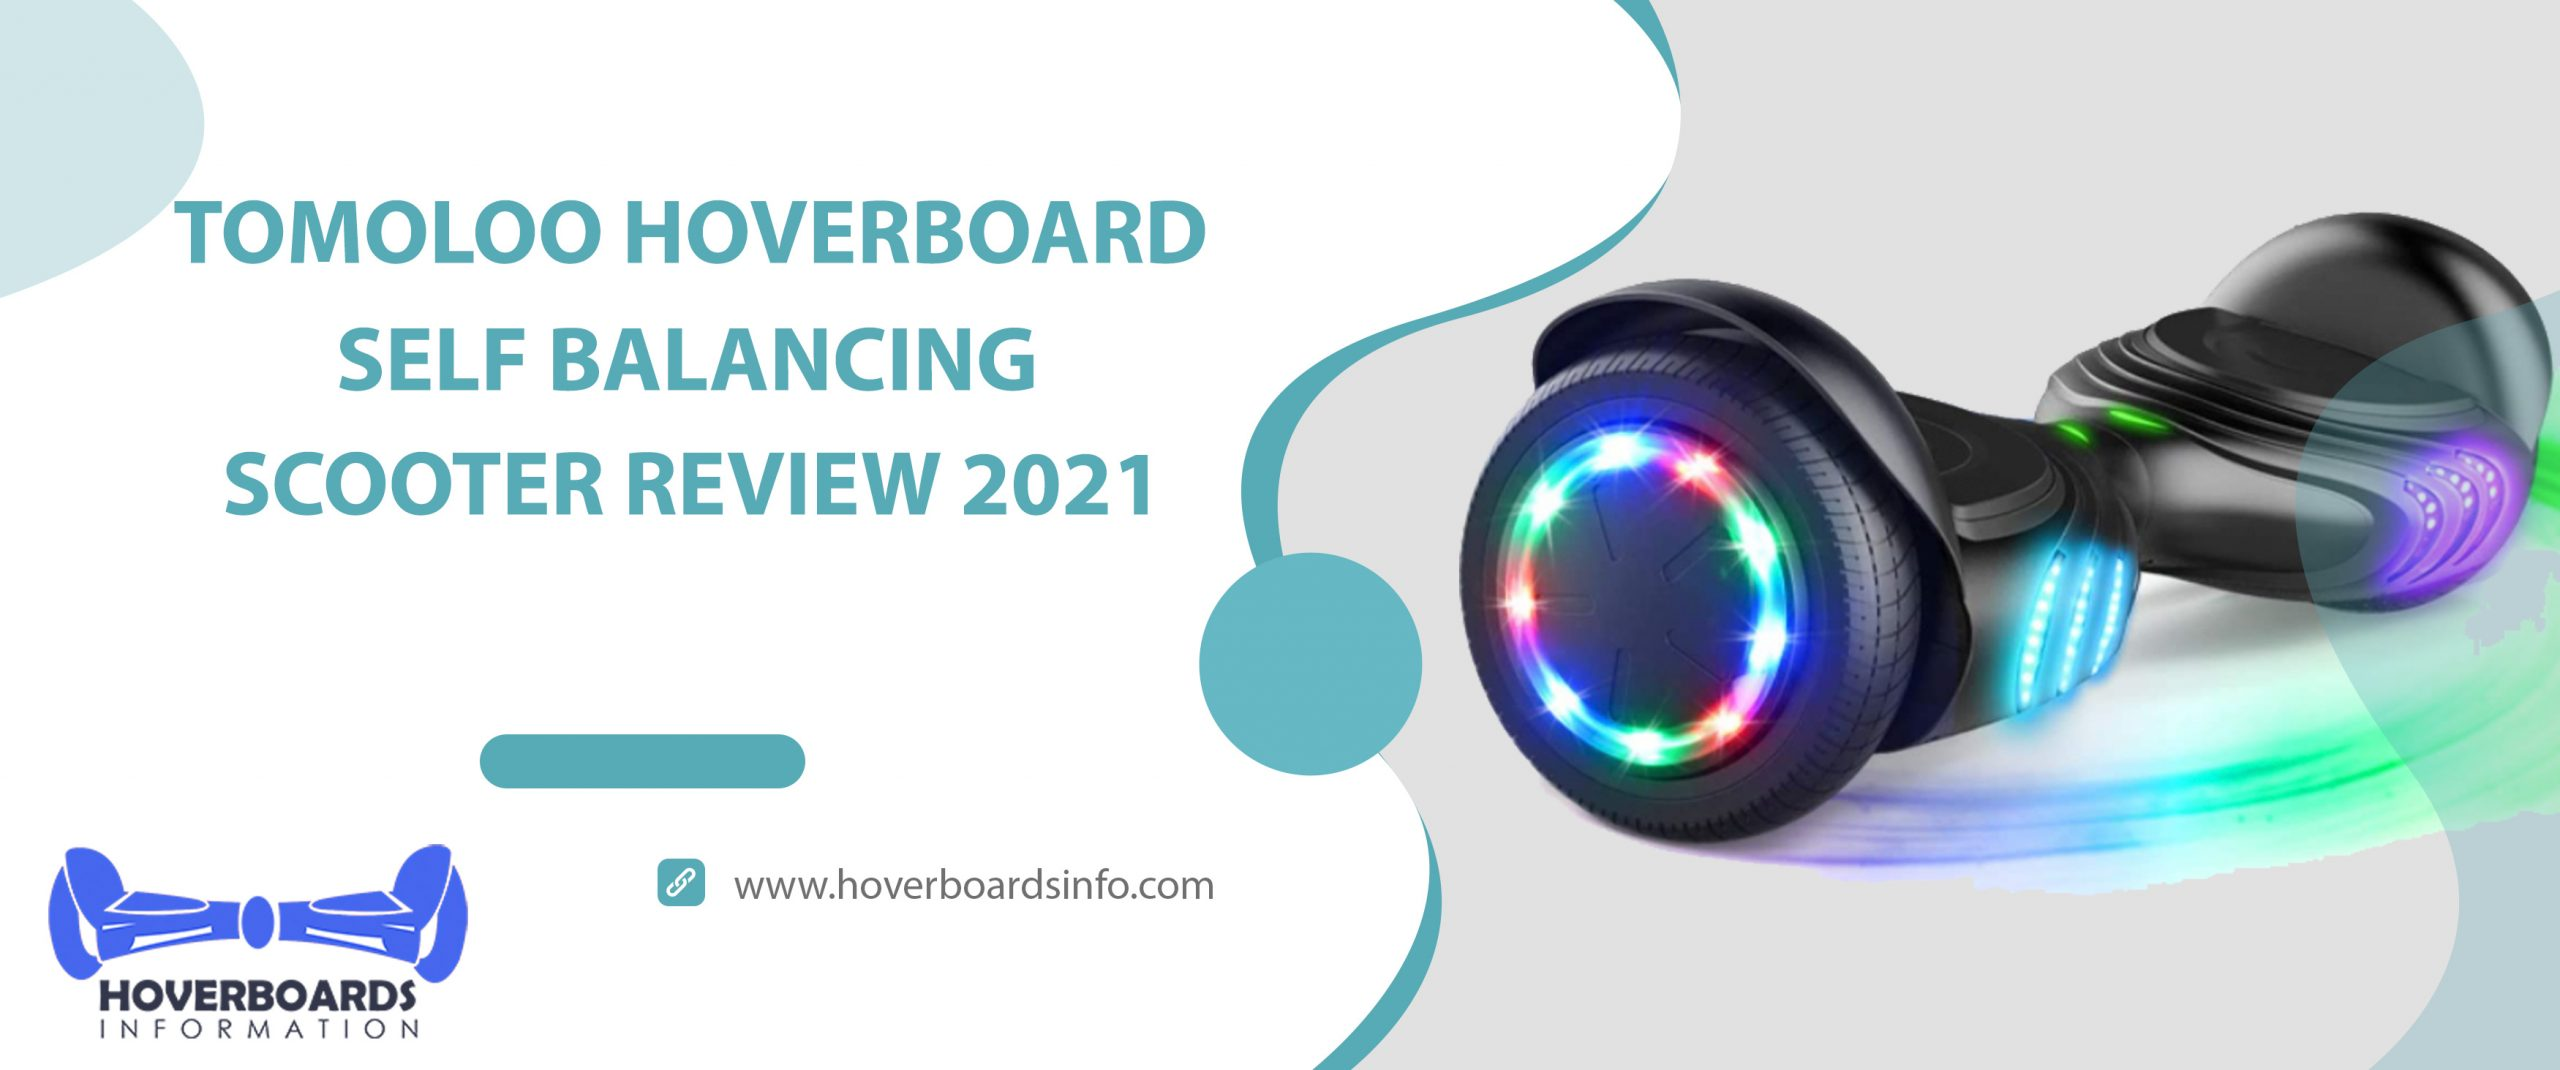 tomoloo-hoverboard-Self-Balancing-Scooter